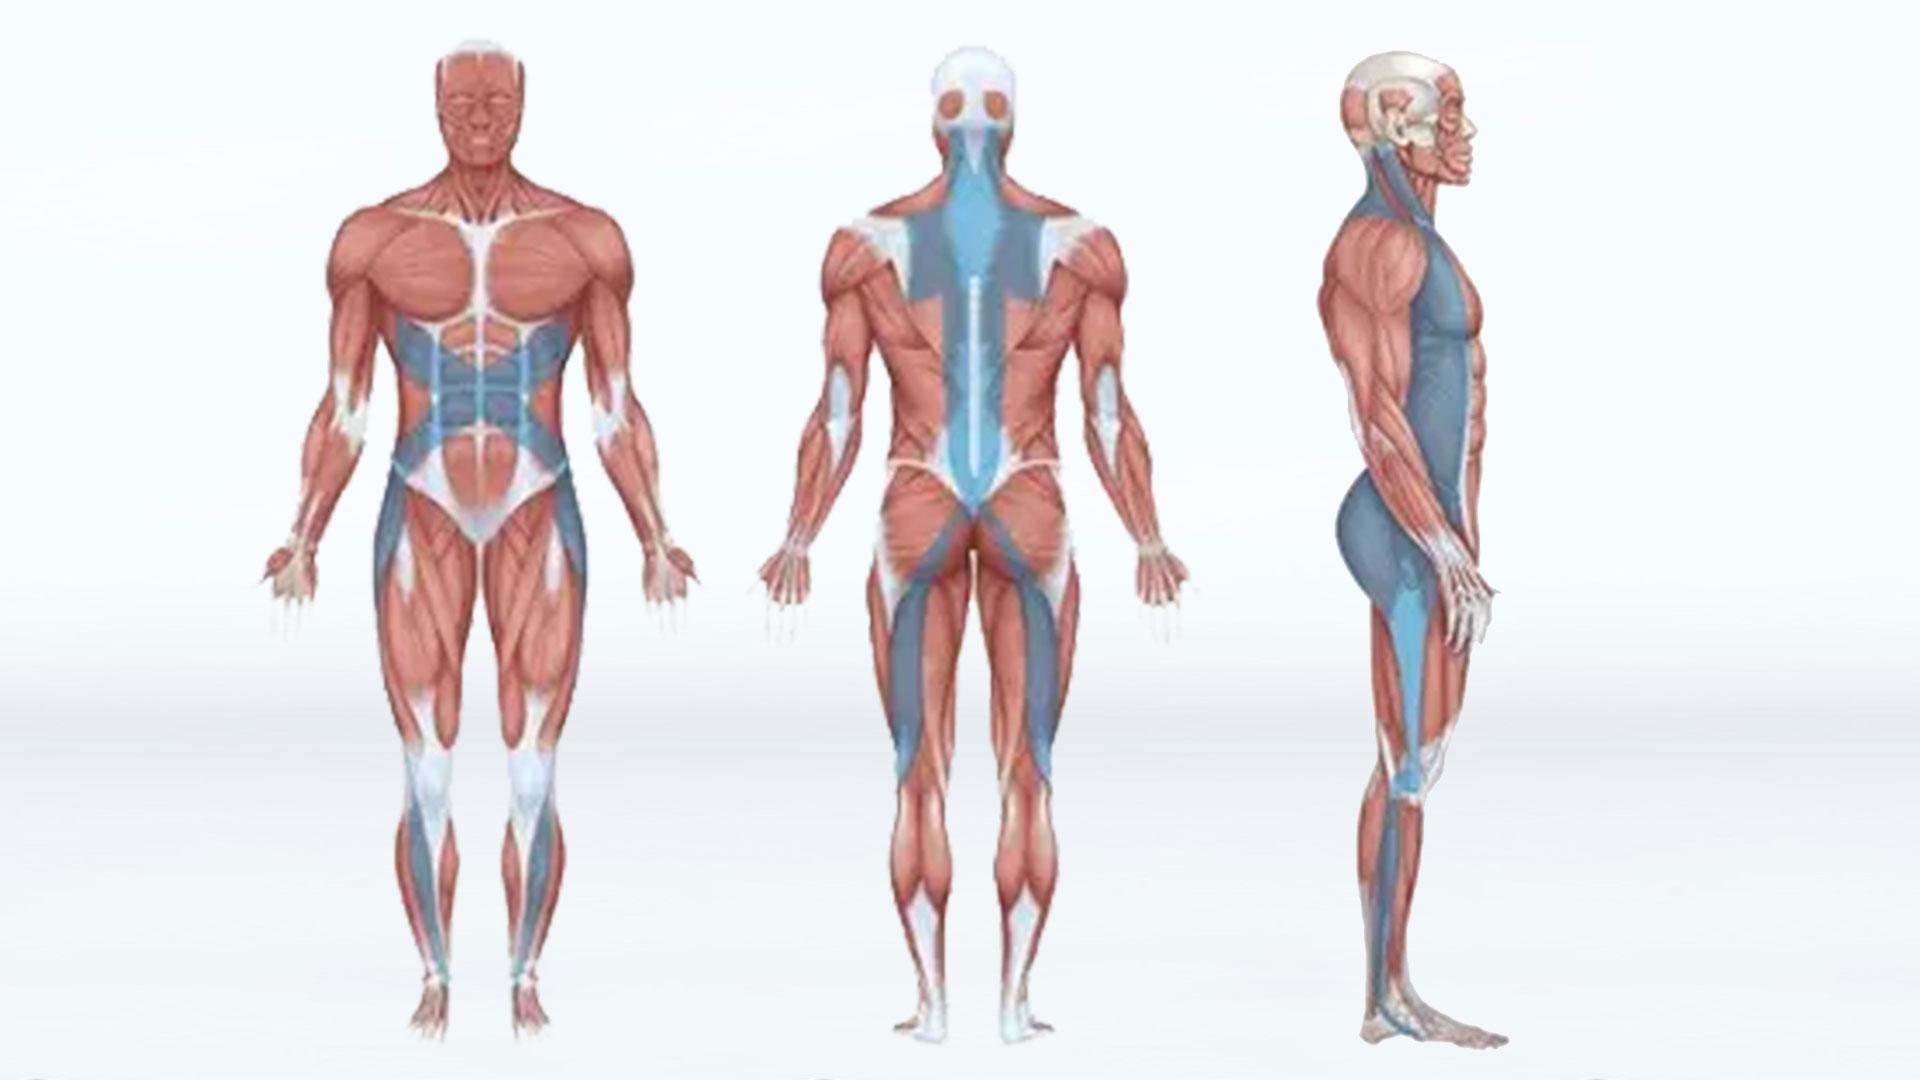 fascia movement assessment